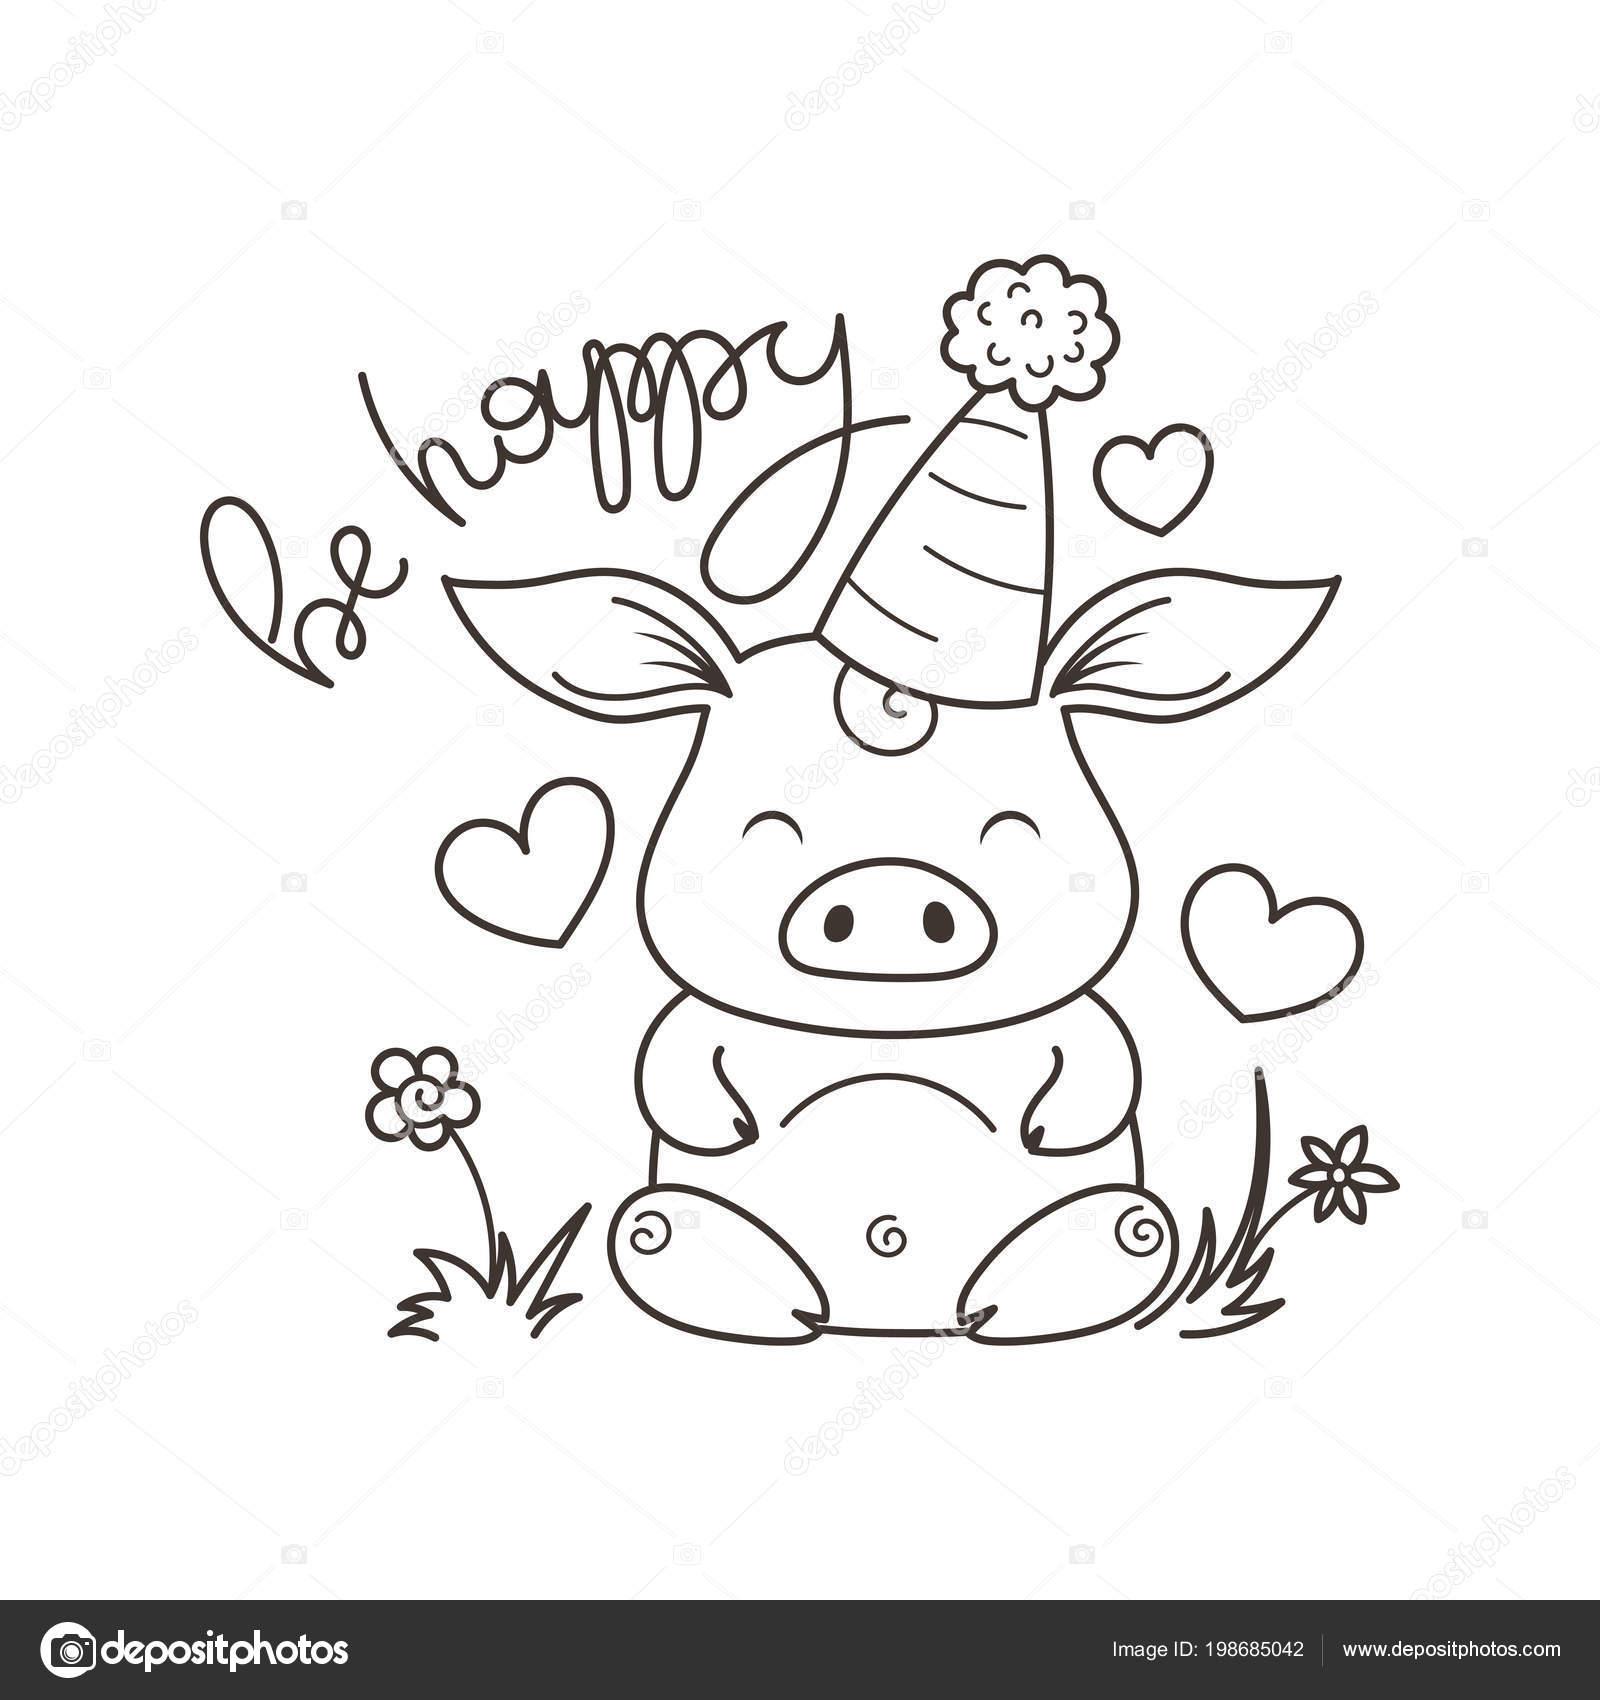 Coloriage Dessin Anime 2019.Cochon Dessin Anime Mignon En Amour Symbole De La Nouvelle Annee